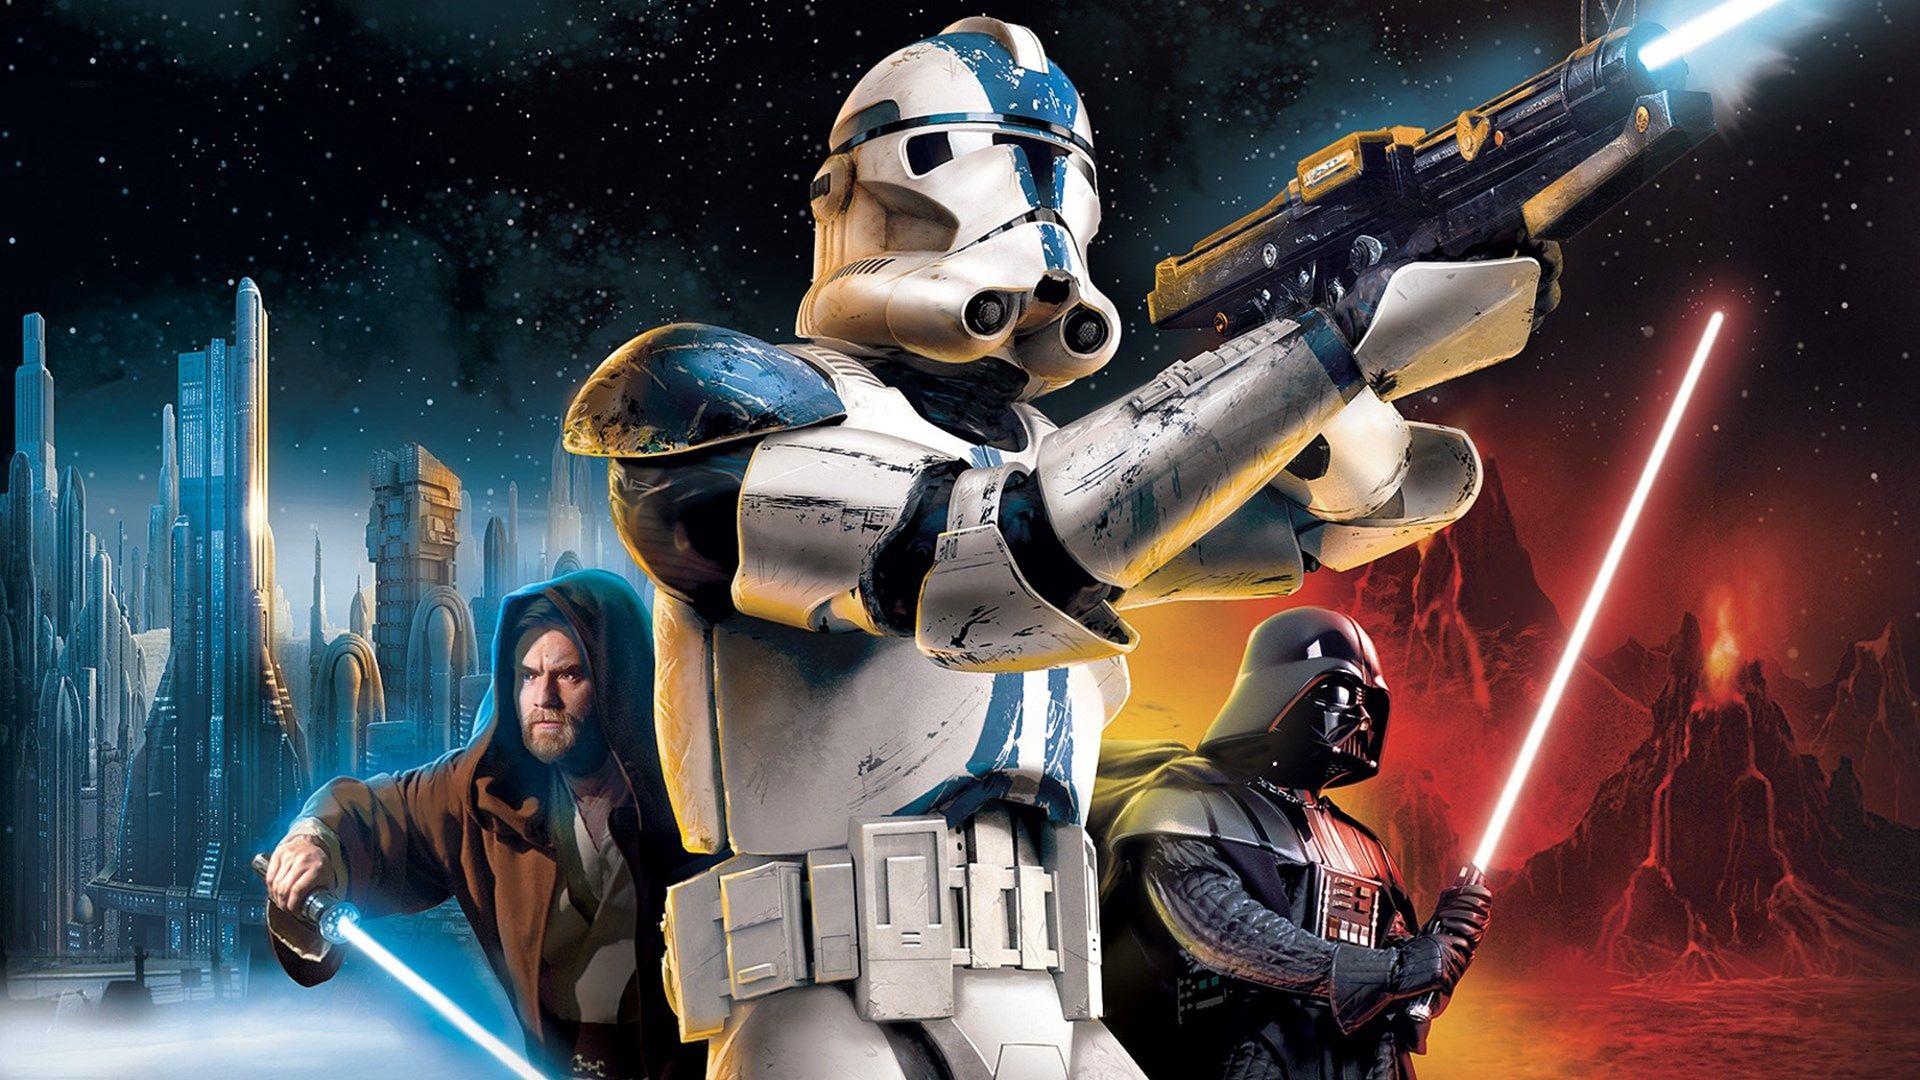 Star Wars Battlefront II £4.59 @ Microsoft Store